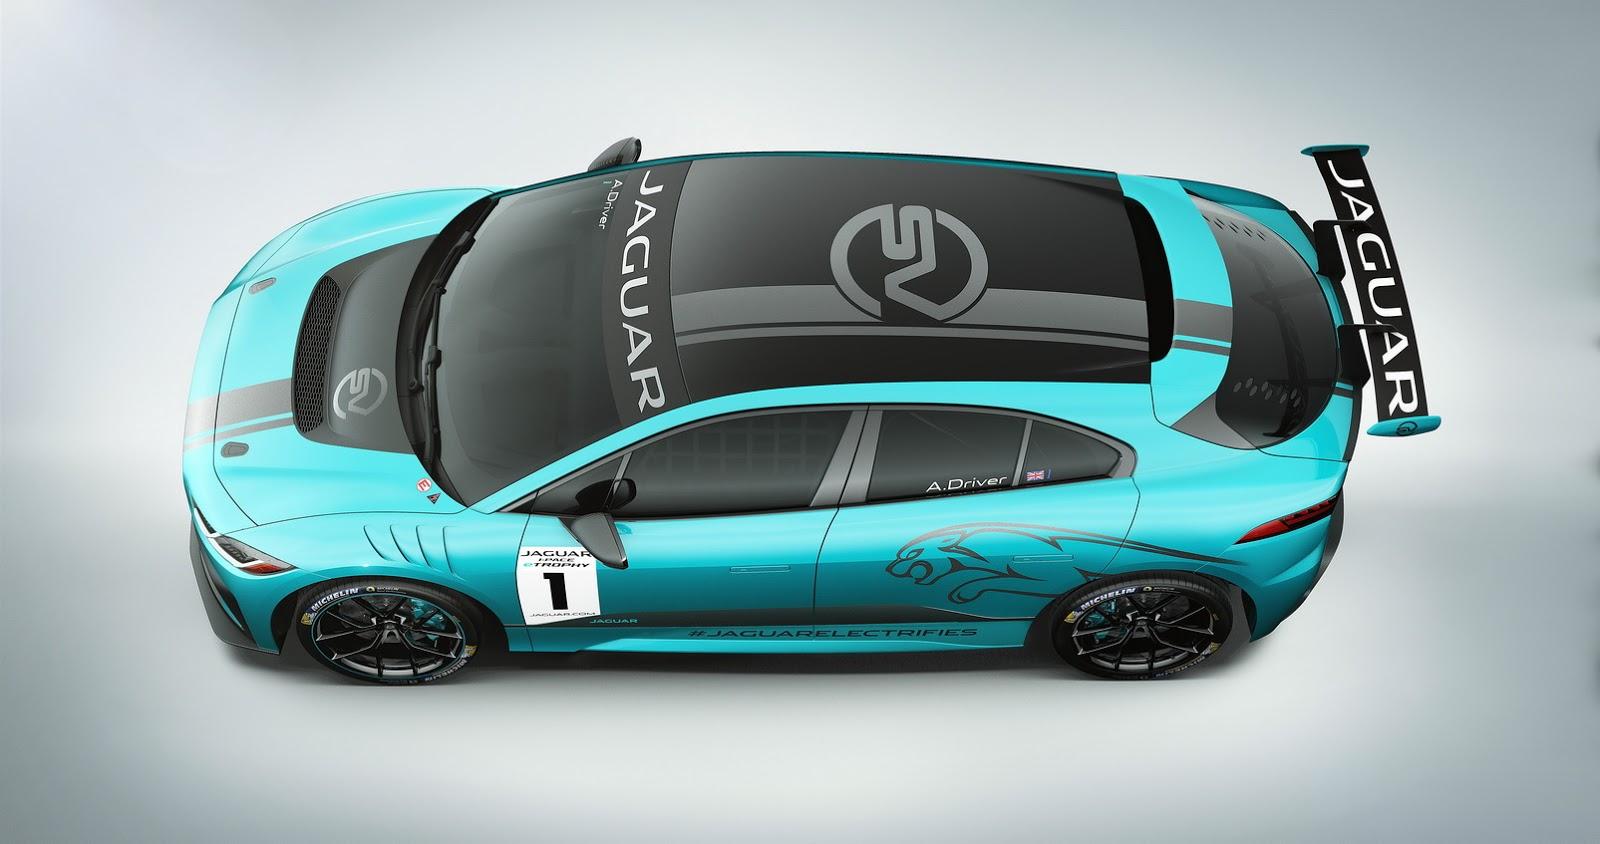 jaguar-ipace-race-car-iaa-31